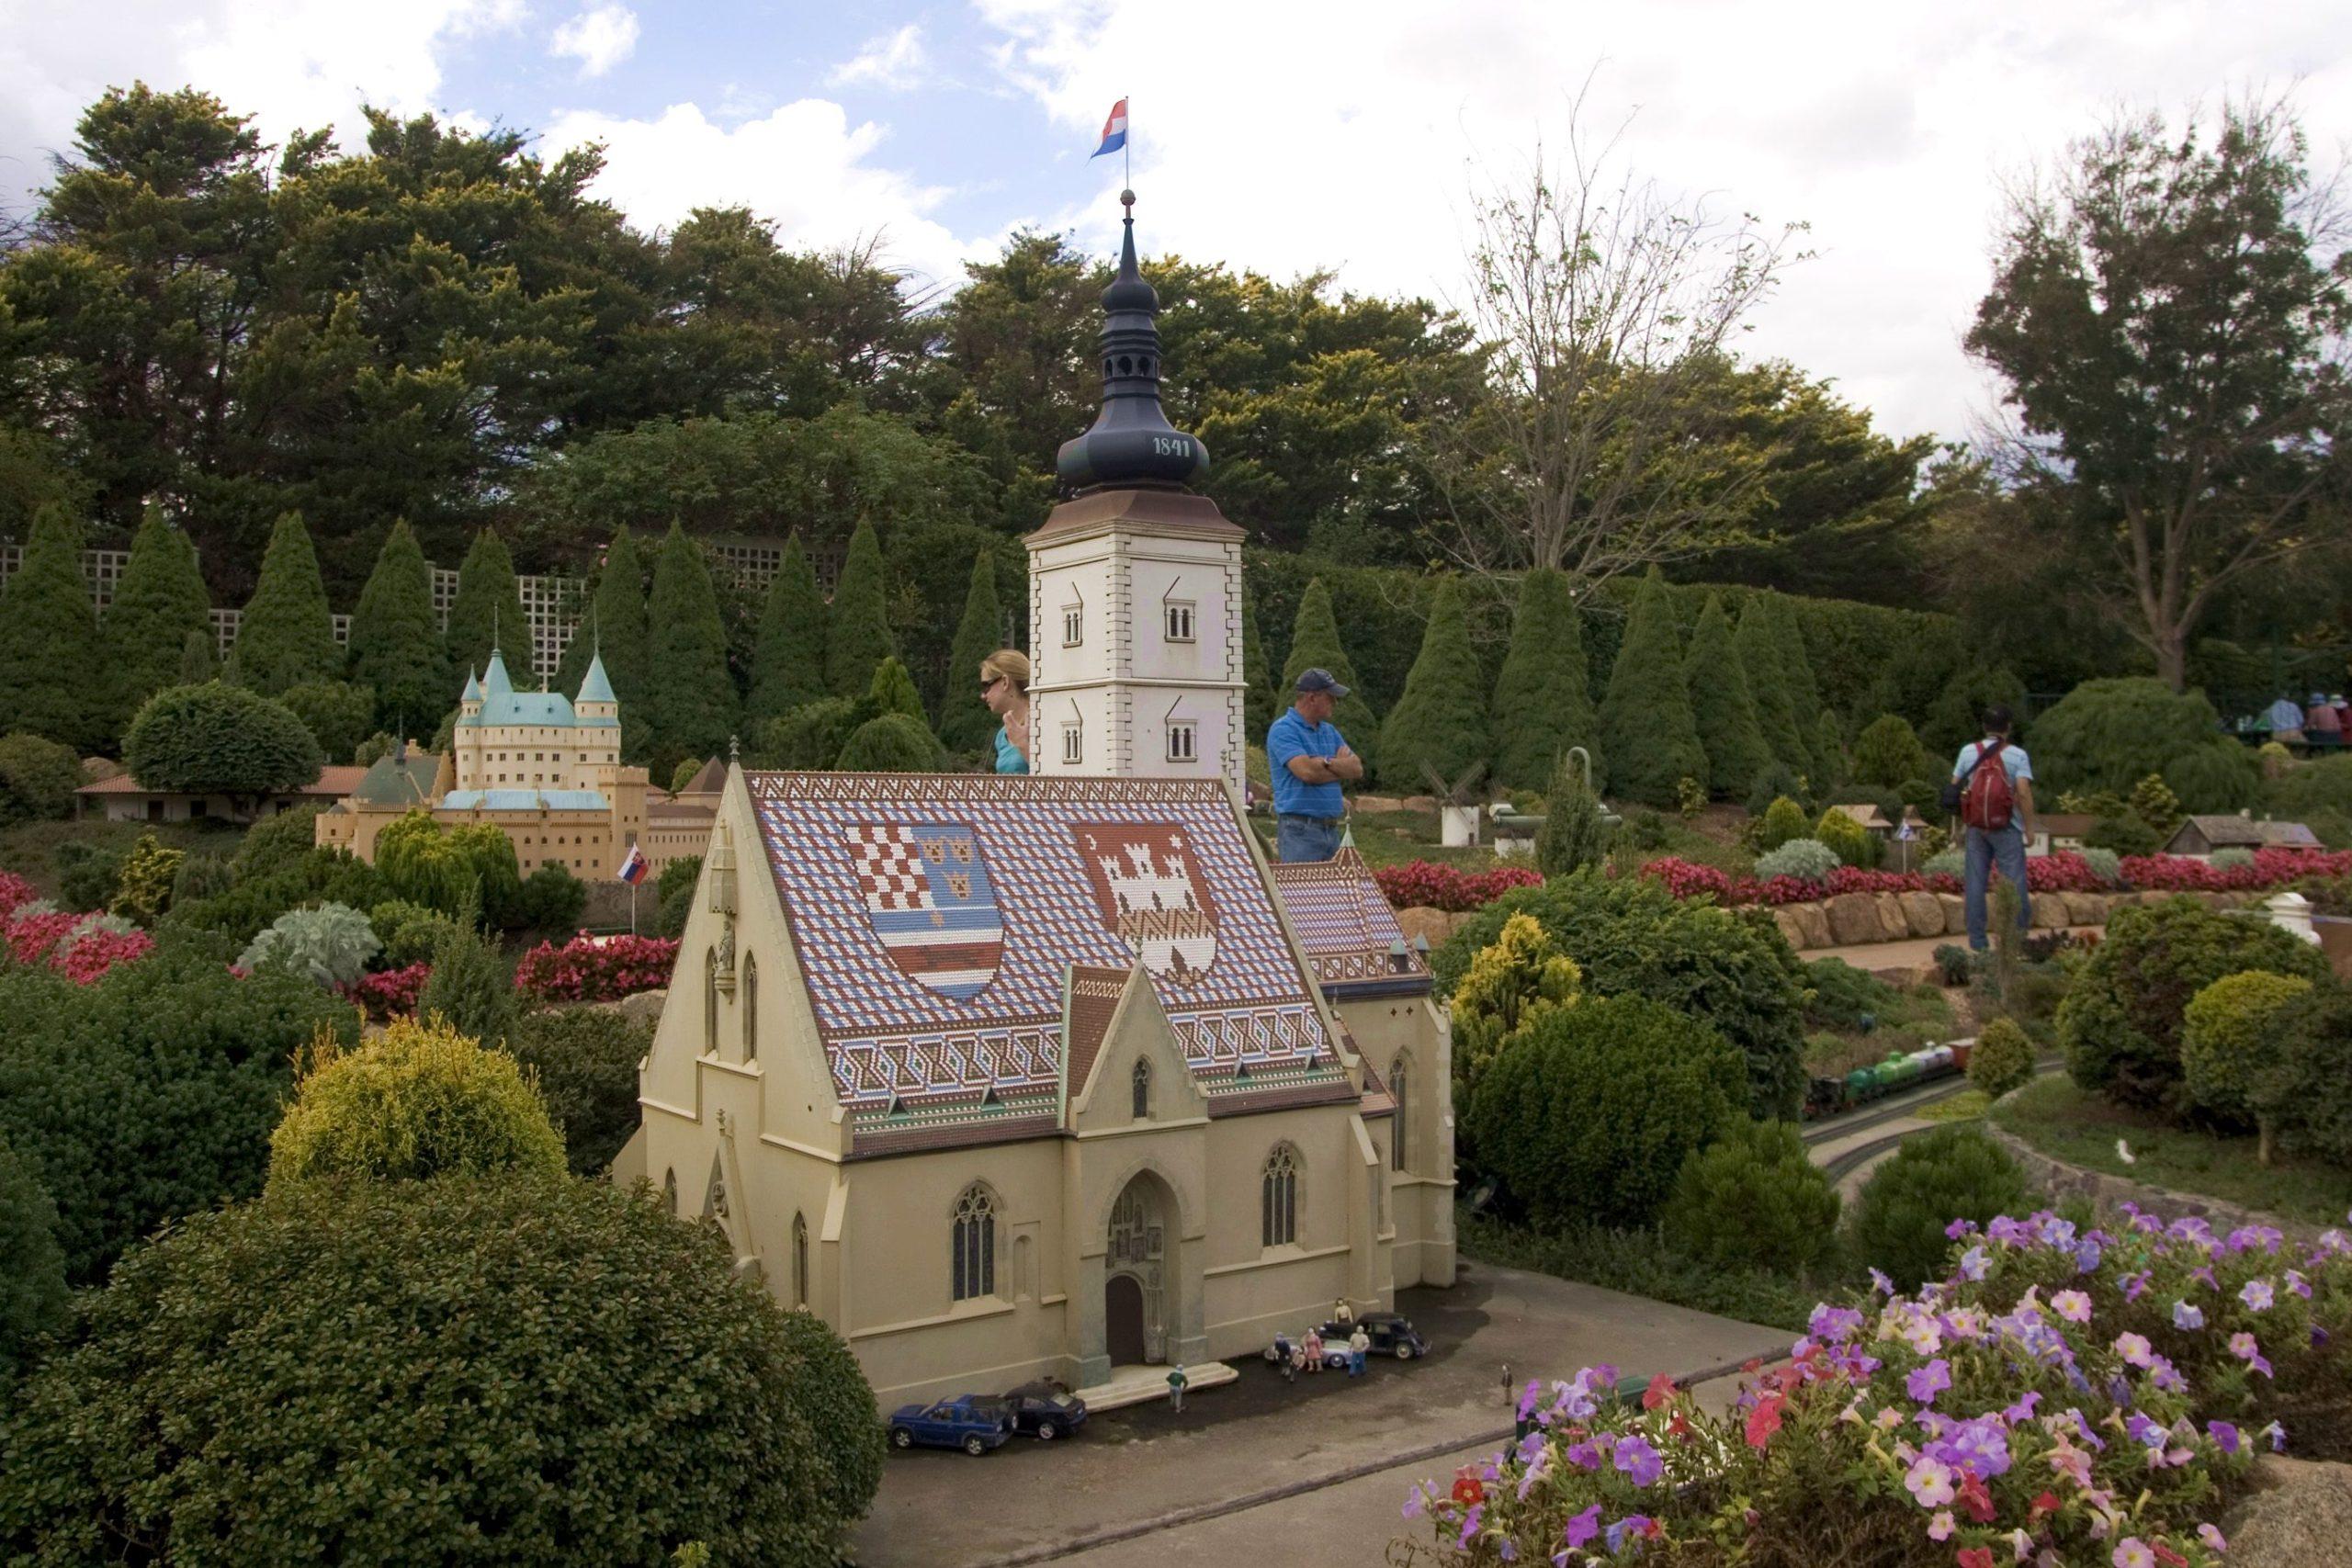 [PHOTO] Zagreb's Famous St. Mark's Church at Miniature Village in Australia